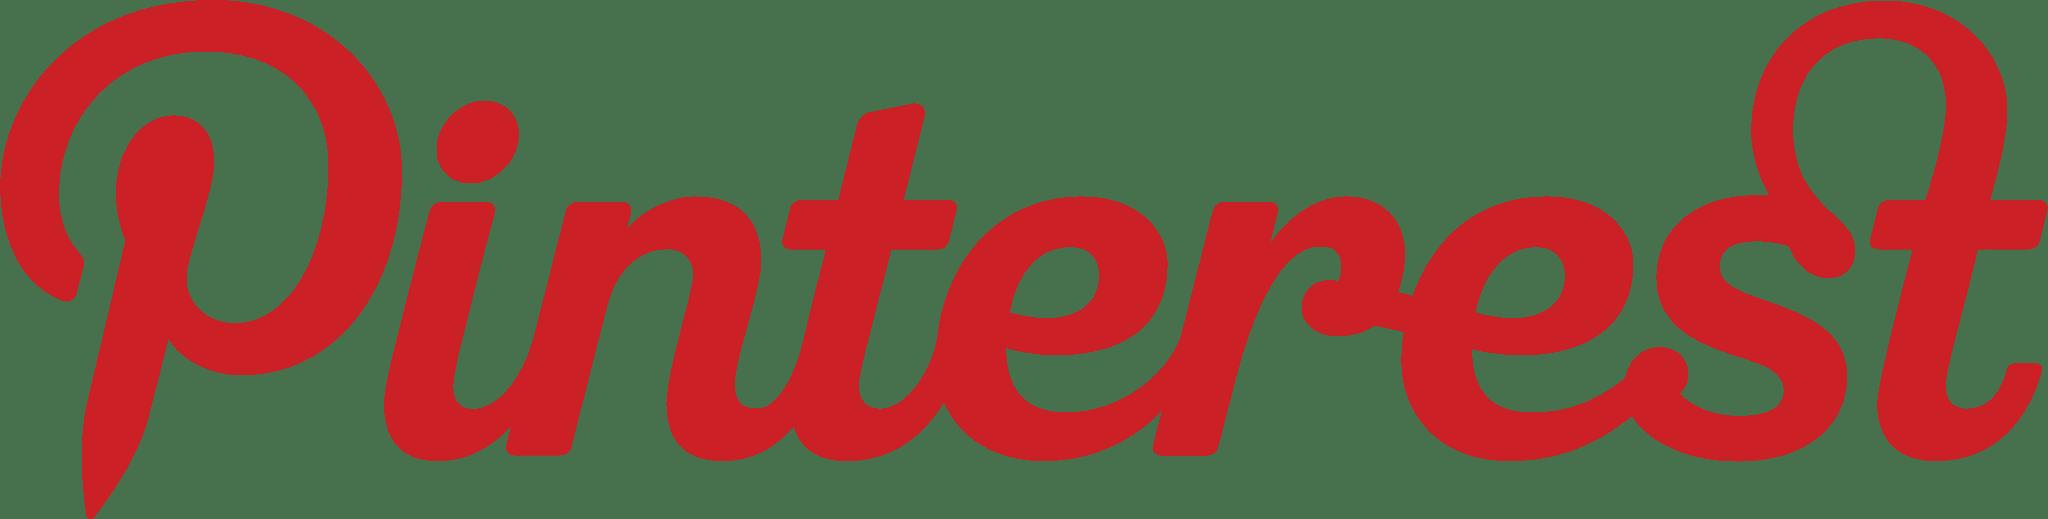 Pinterest Logo1 300x75 Pinterest social marketing: how to do it